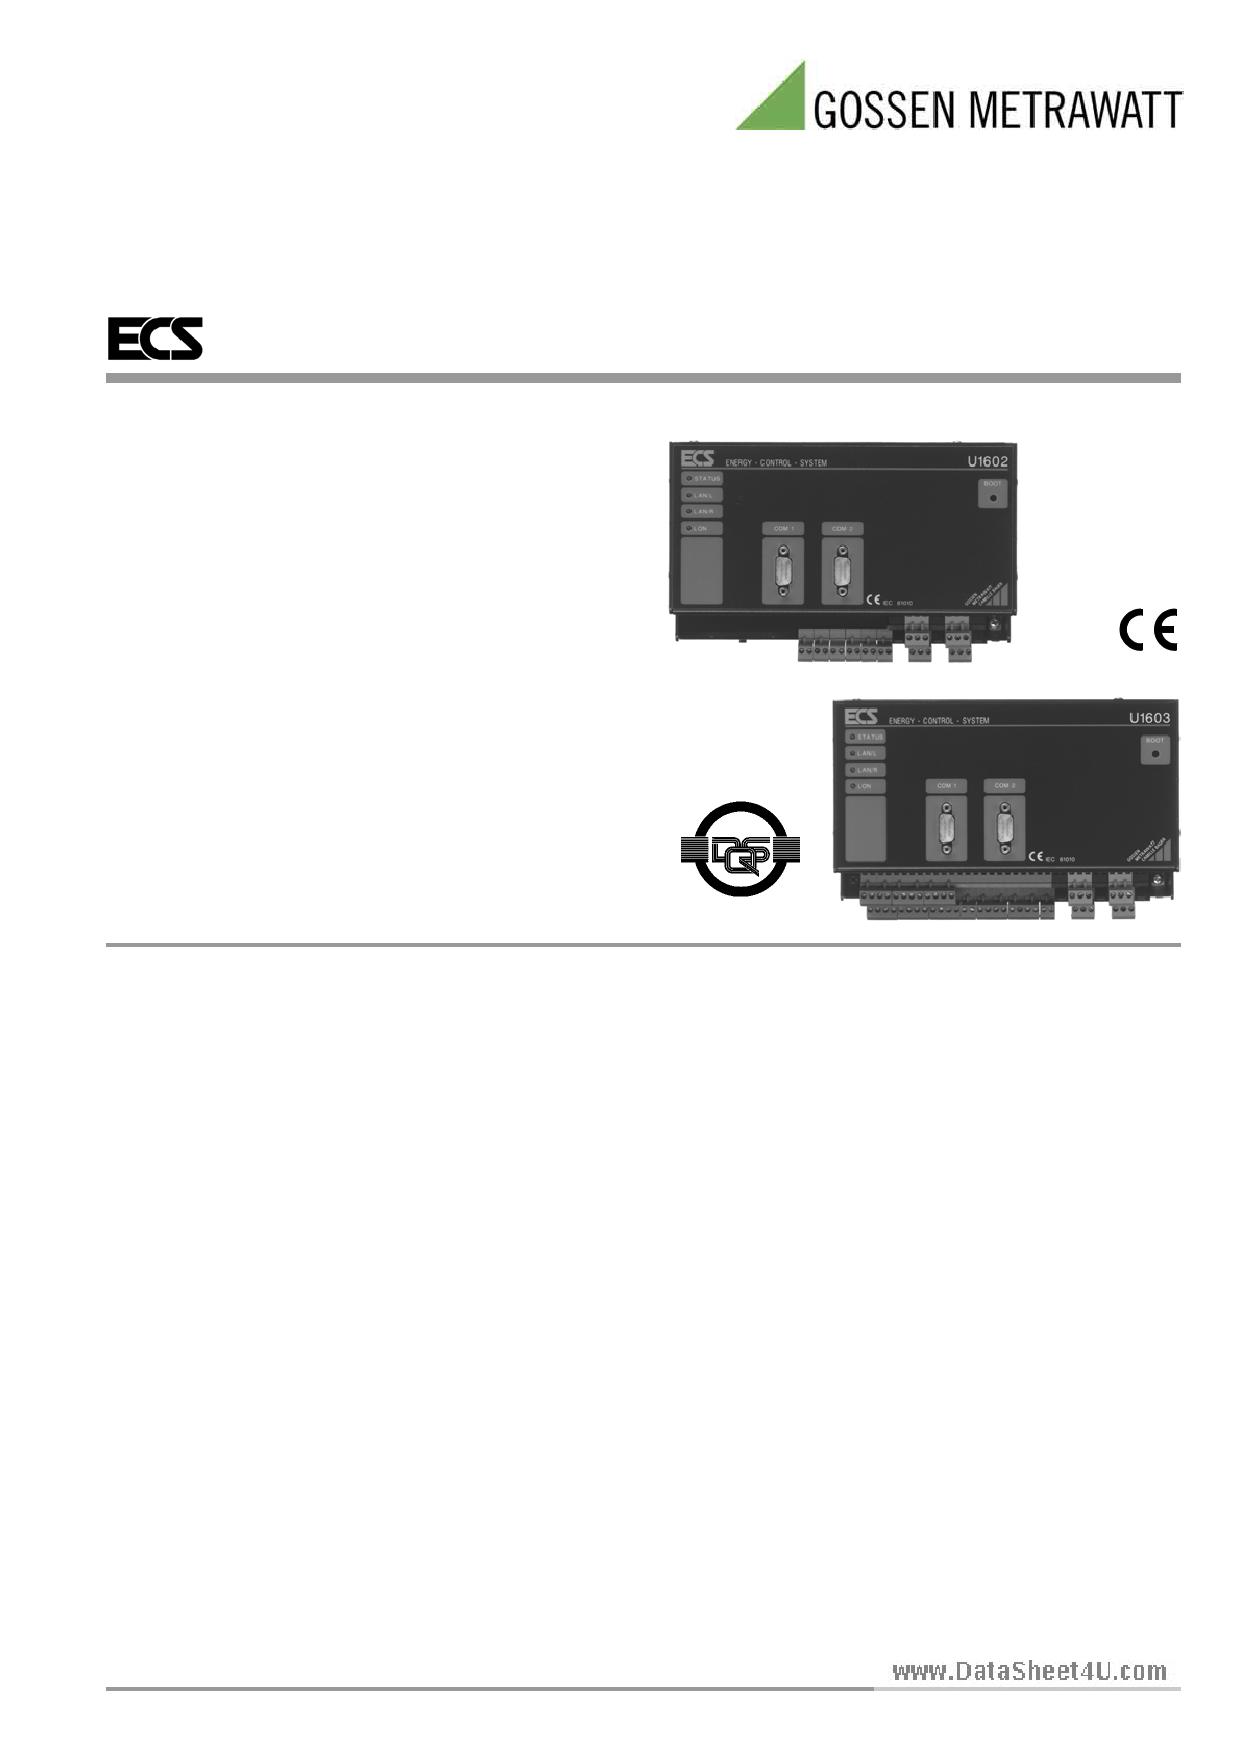 U1602 datasheet